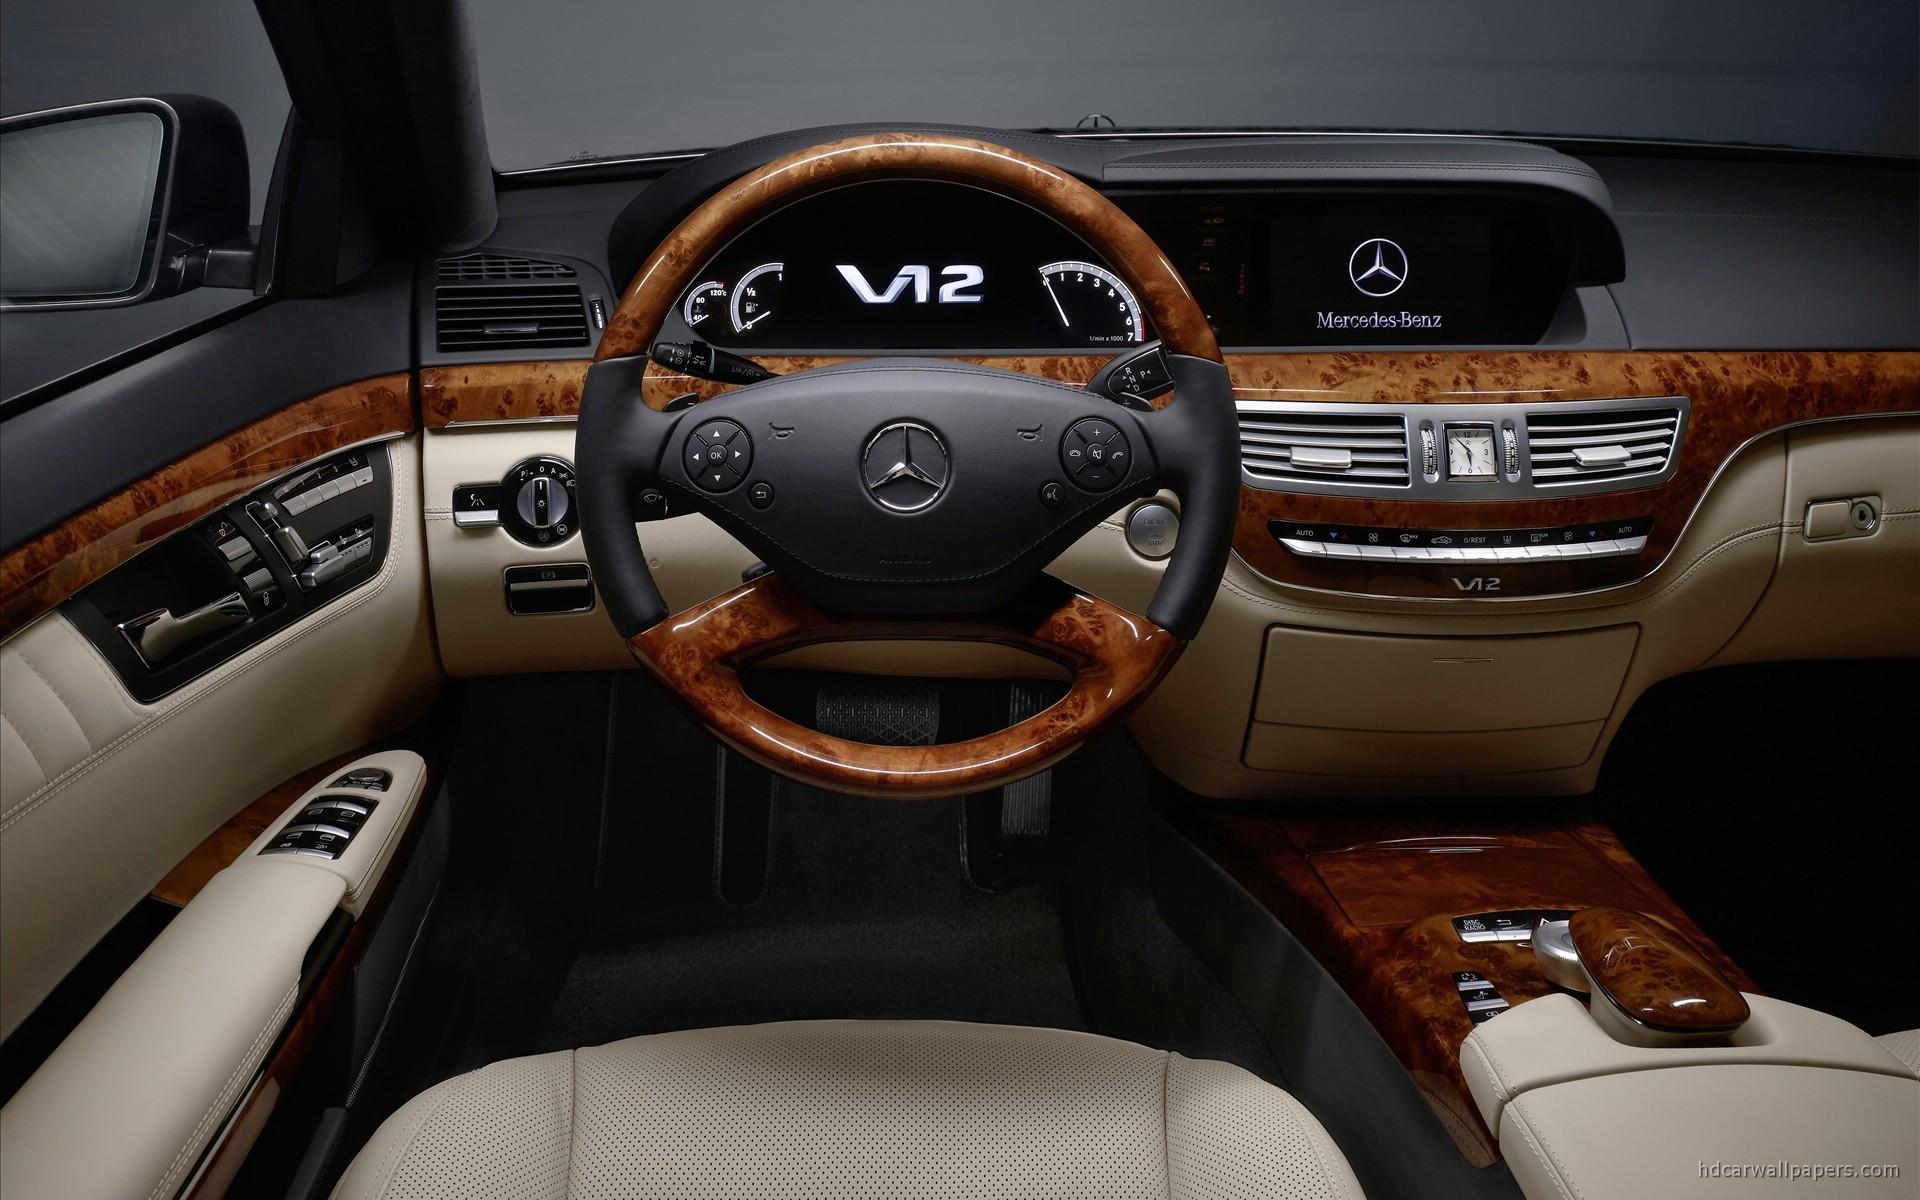 Mclaren Iphone Wallpaper 2010 Mercedes Benz S Class Interior Wallpaper Hd Car